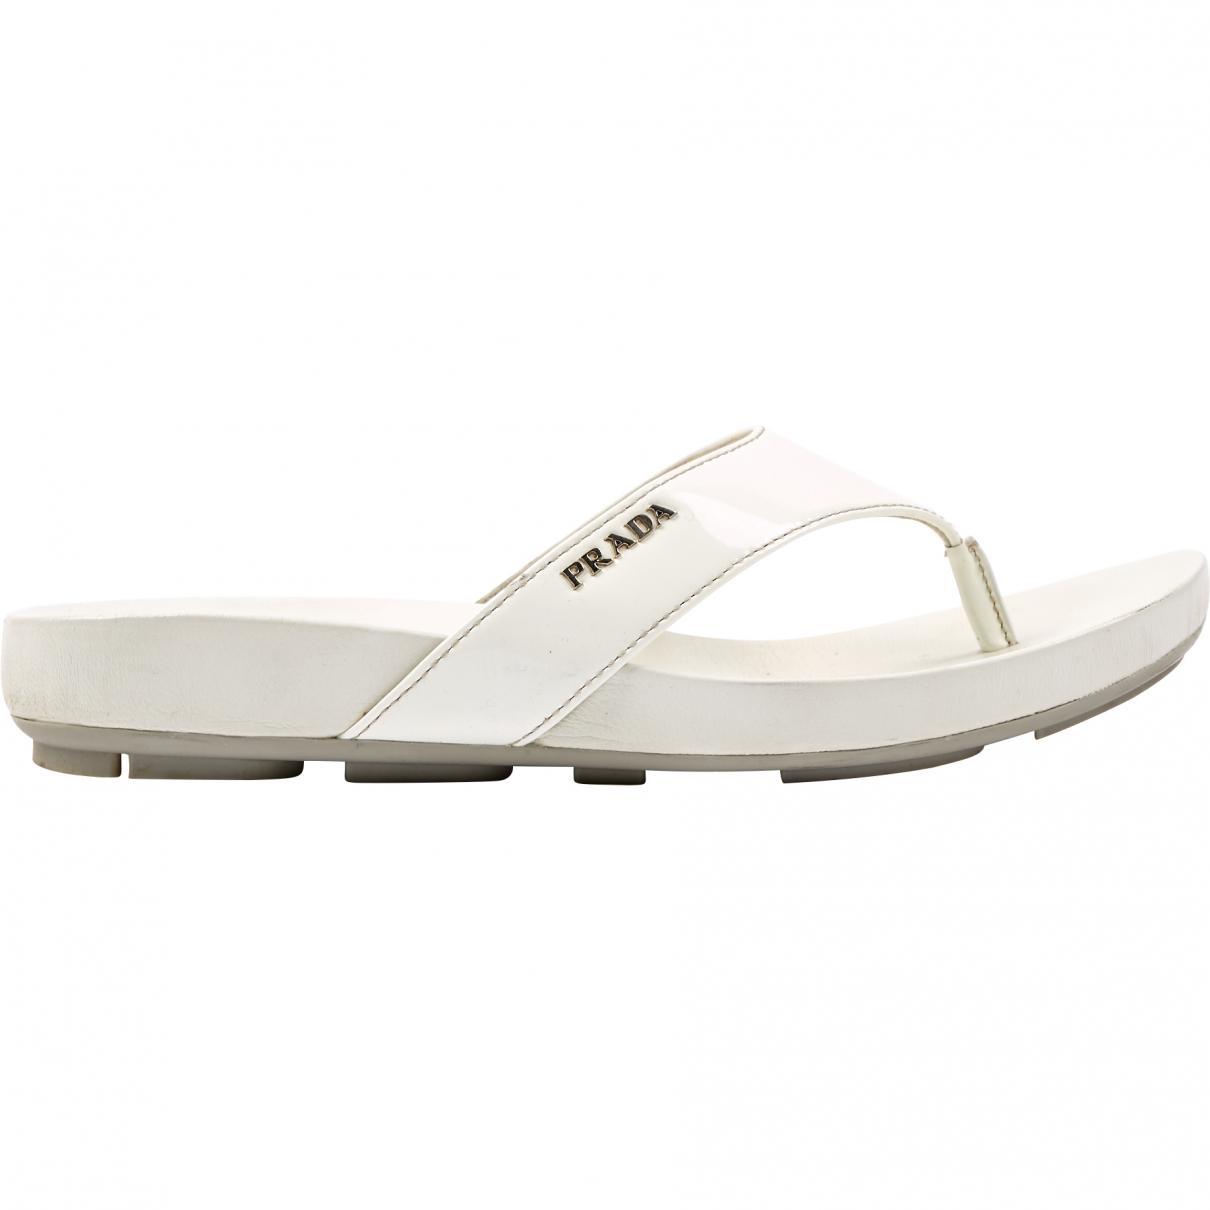 Prada \N White Leather Sandals for Women 41 EU